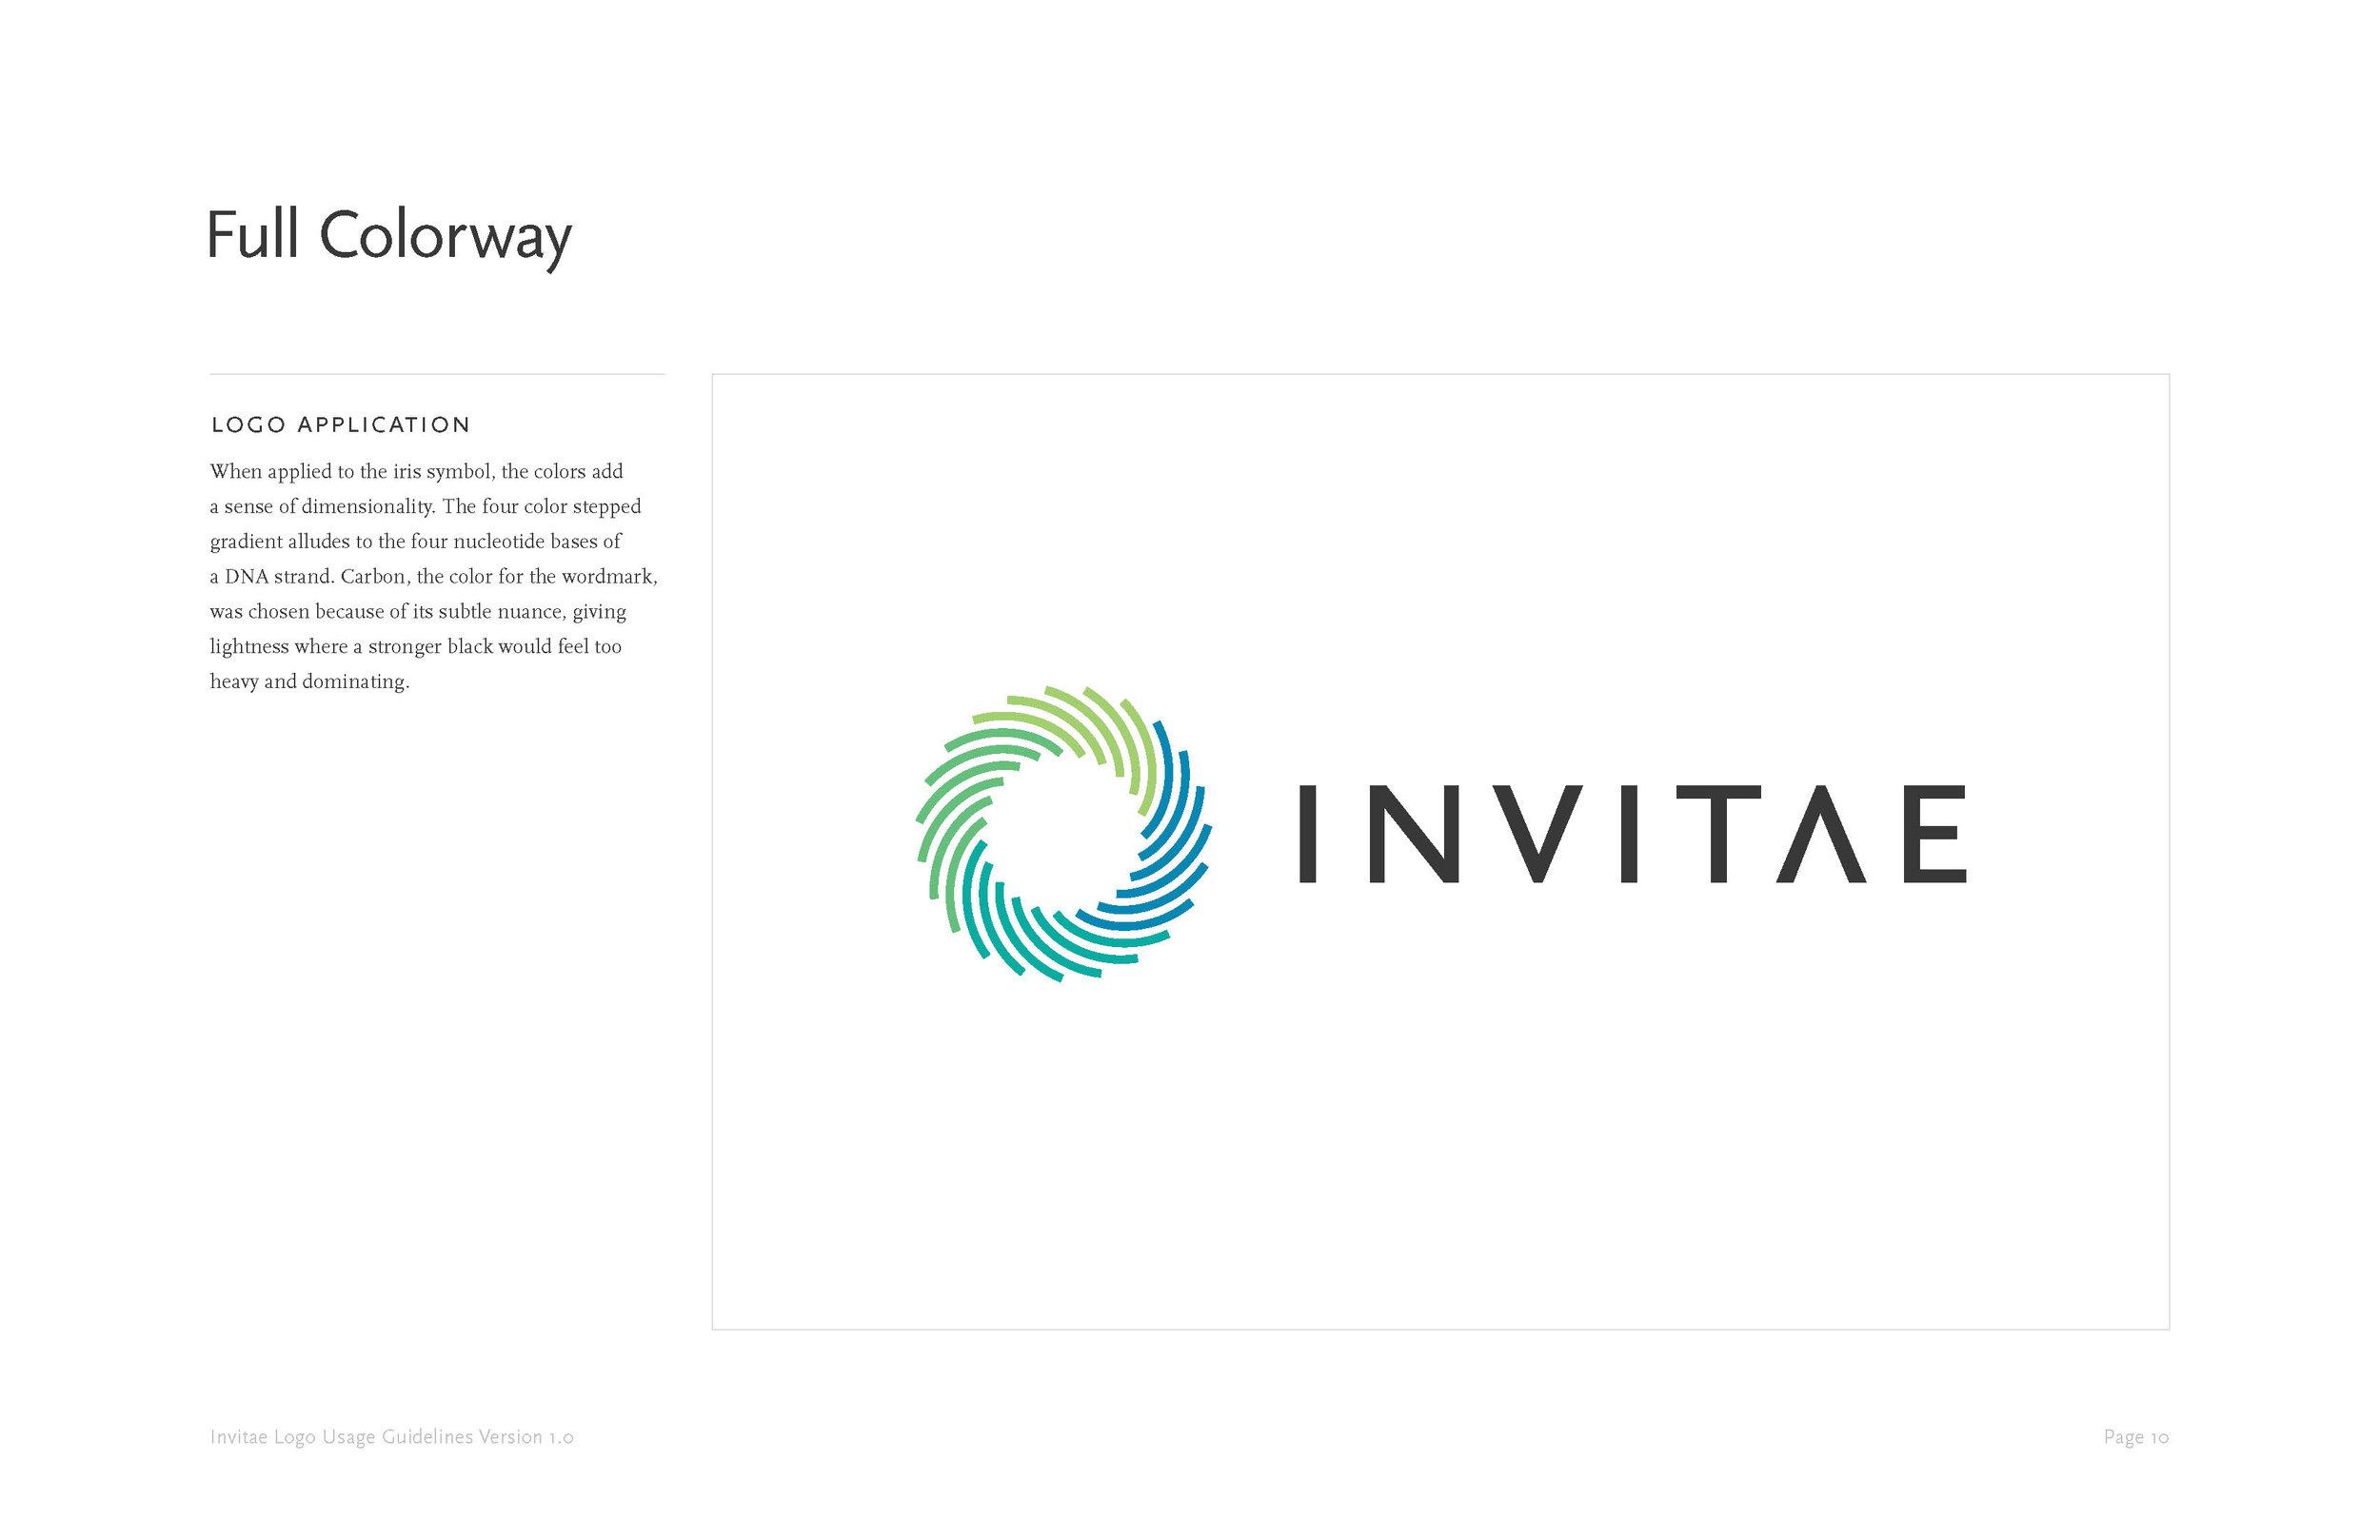 Invitae_logo_guidelines_Page_12.jpg